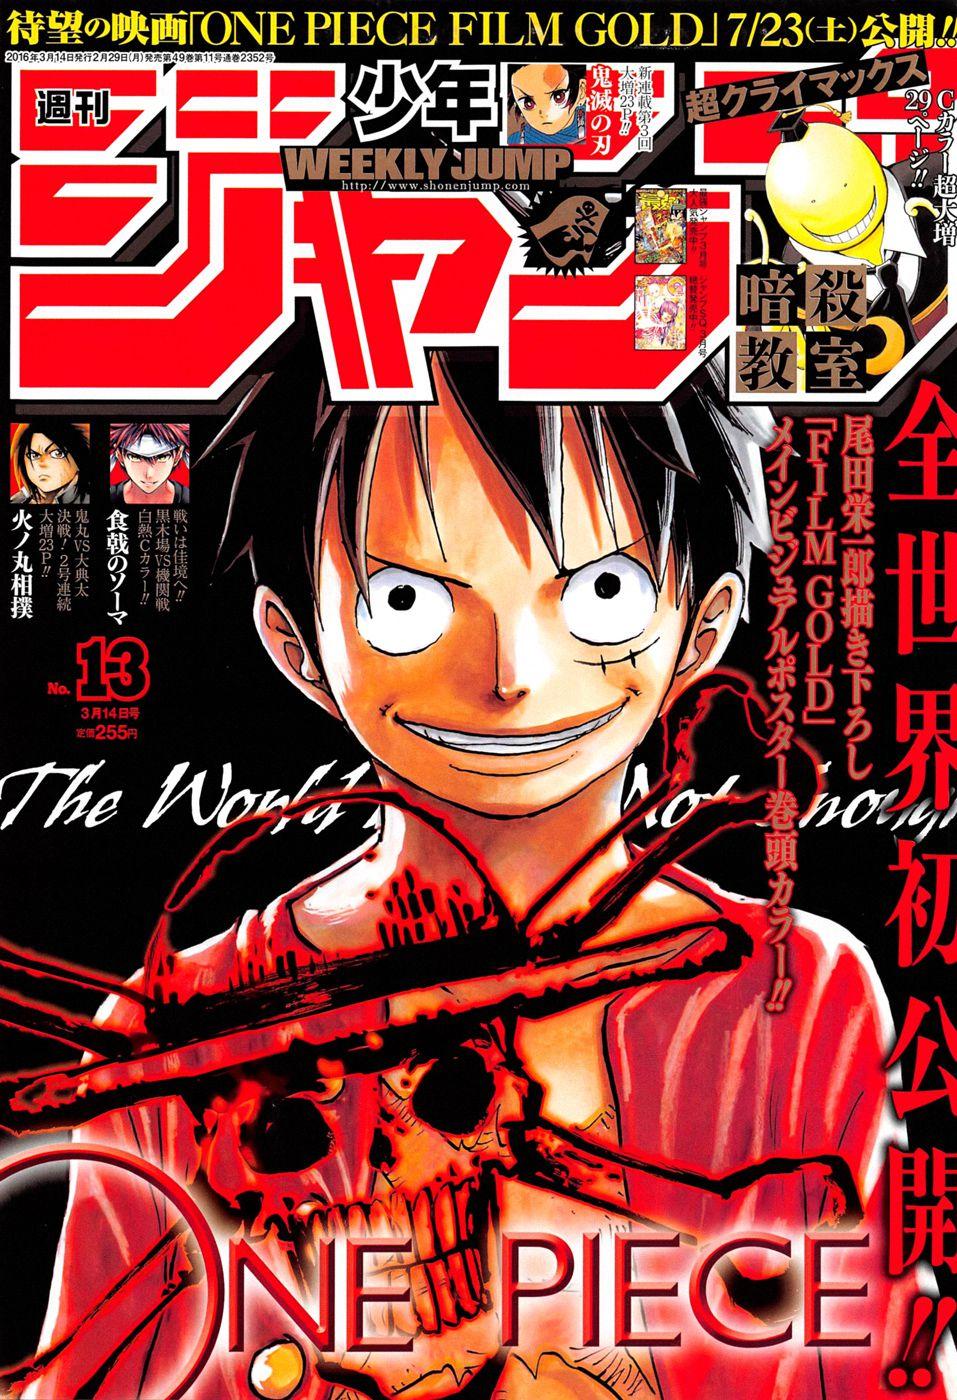 Top 10 Des Meilleurs Manga : meilleurs, manga, Épinglé, Piece, Anime,, Manga,, Meilleur, Manga